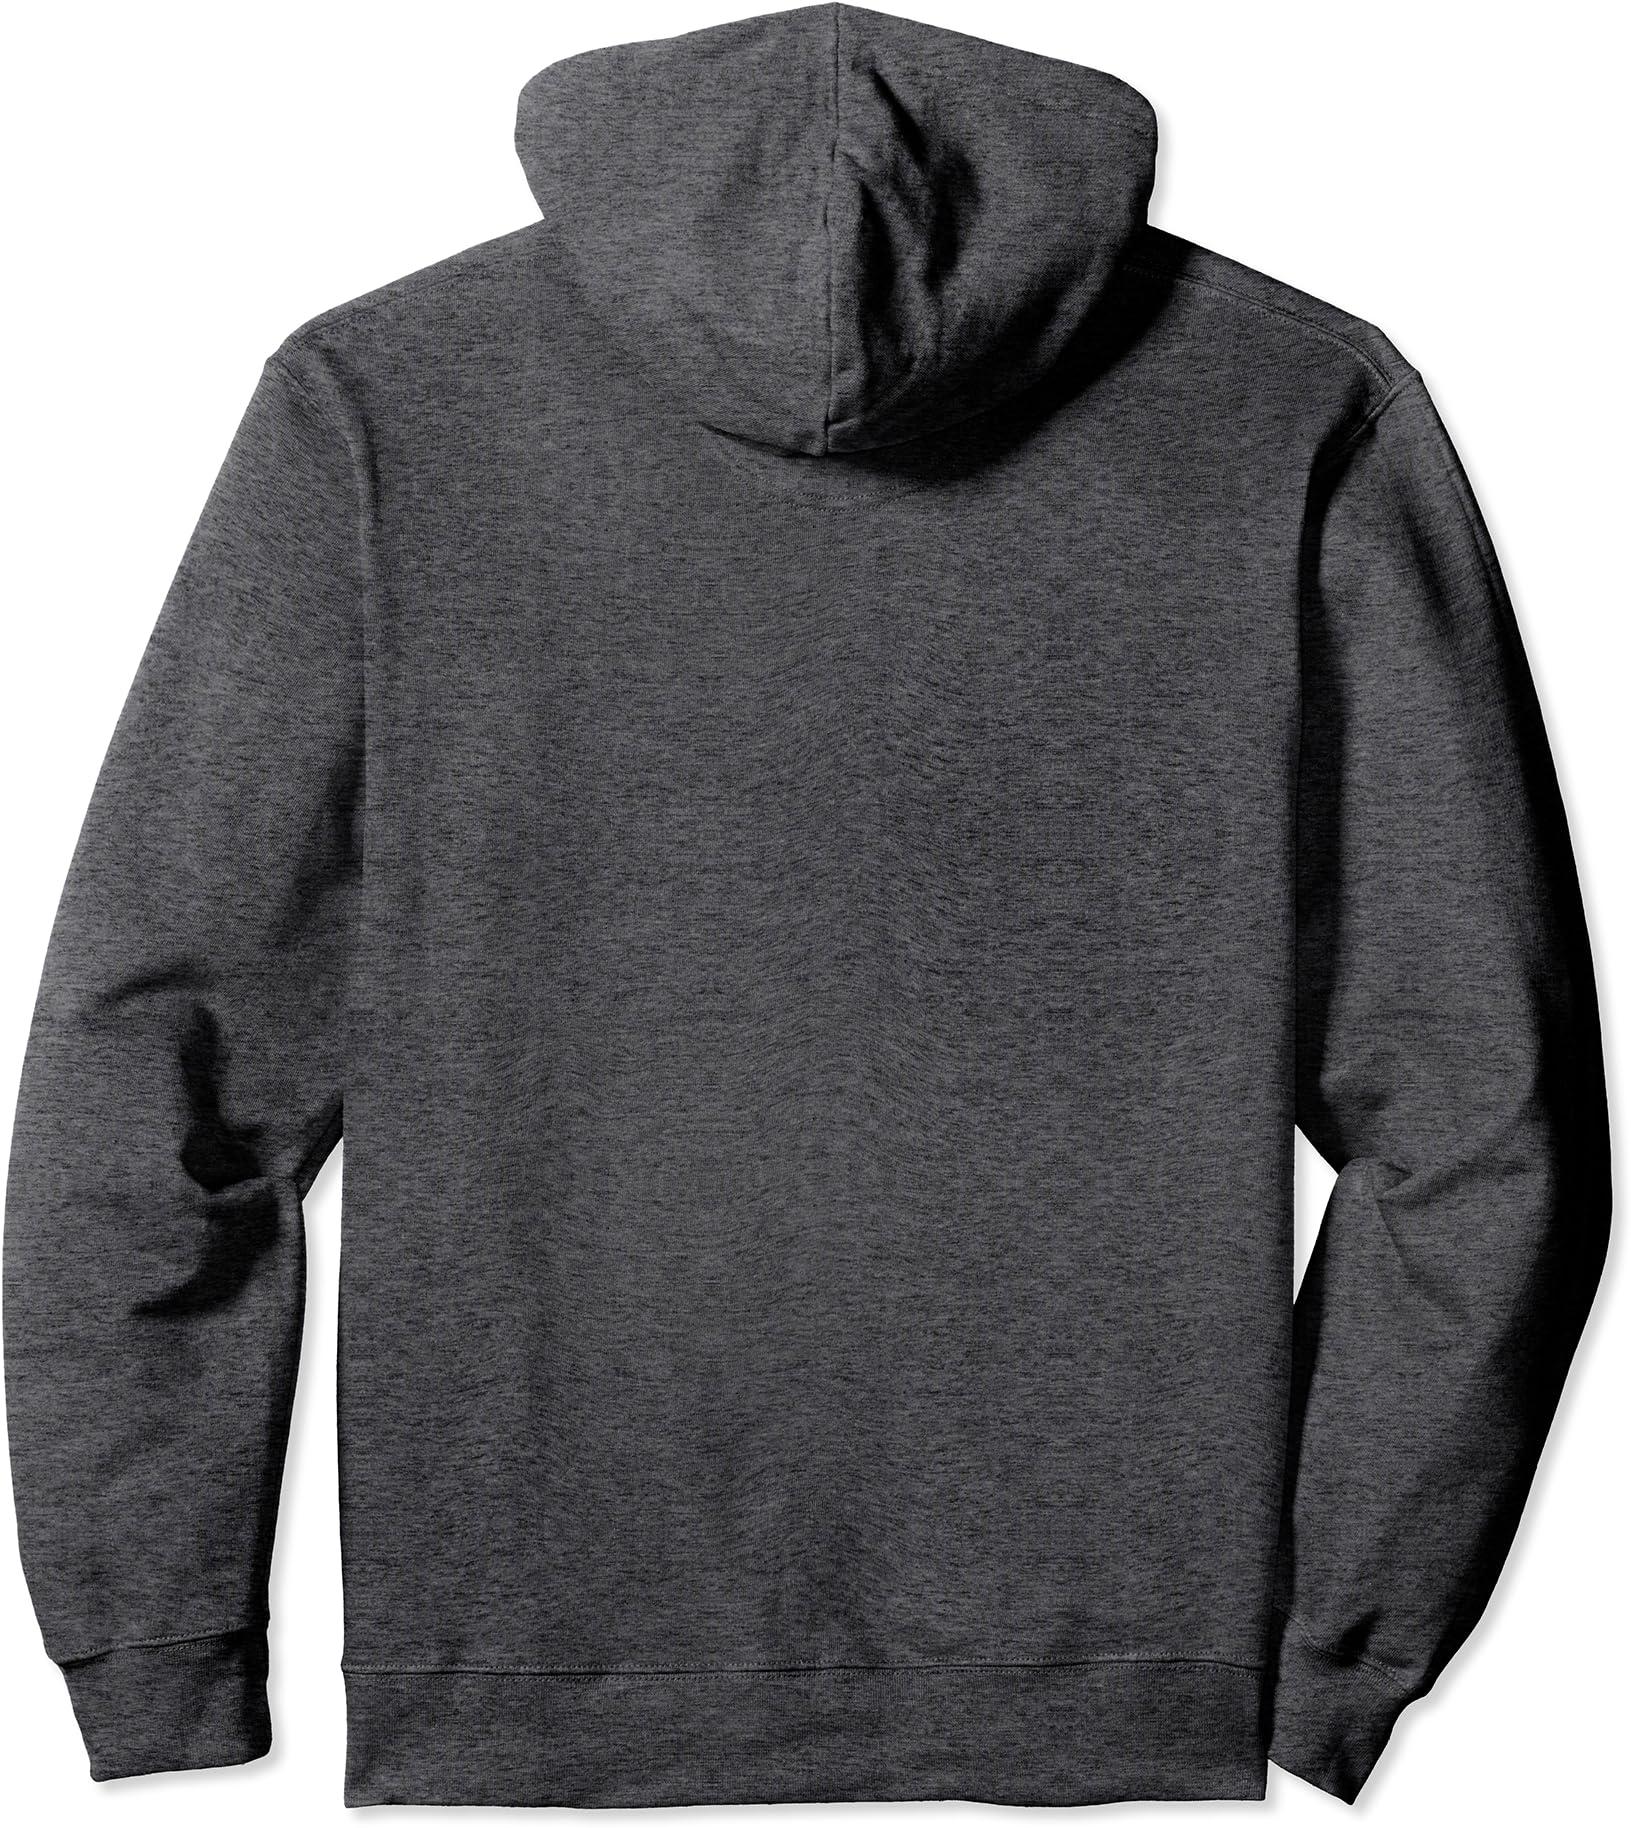 tee My Favorite Veteran Amazing Father/_s Day and Gift Unisex Sweatshirt